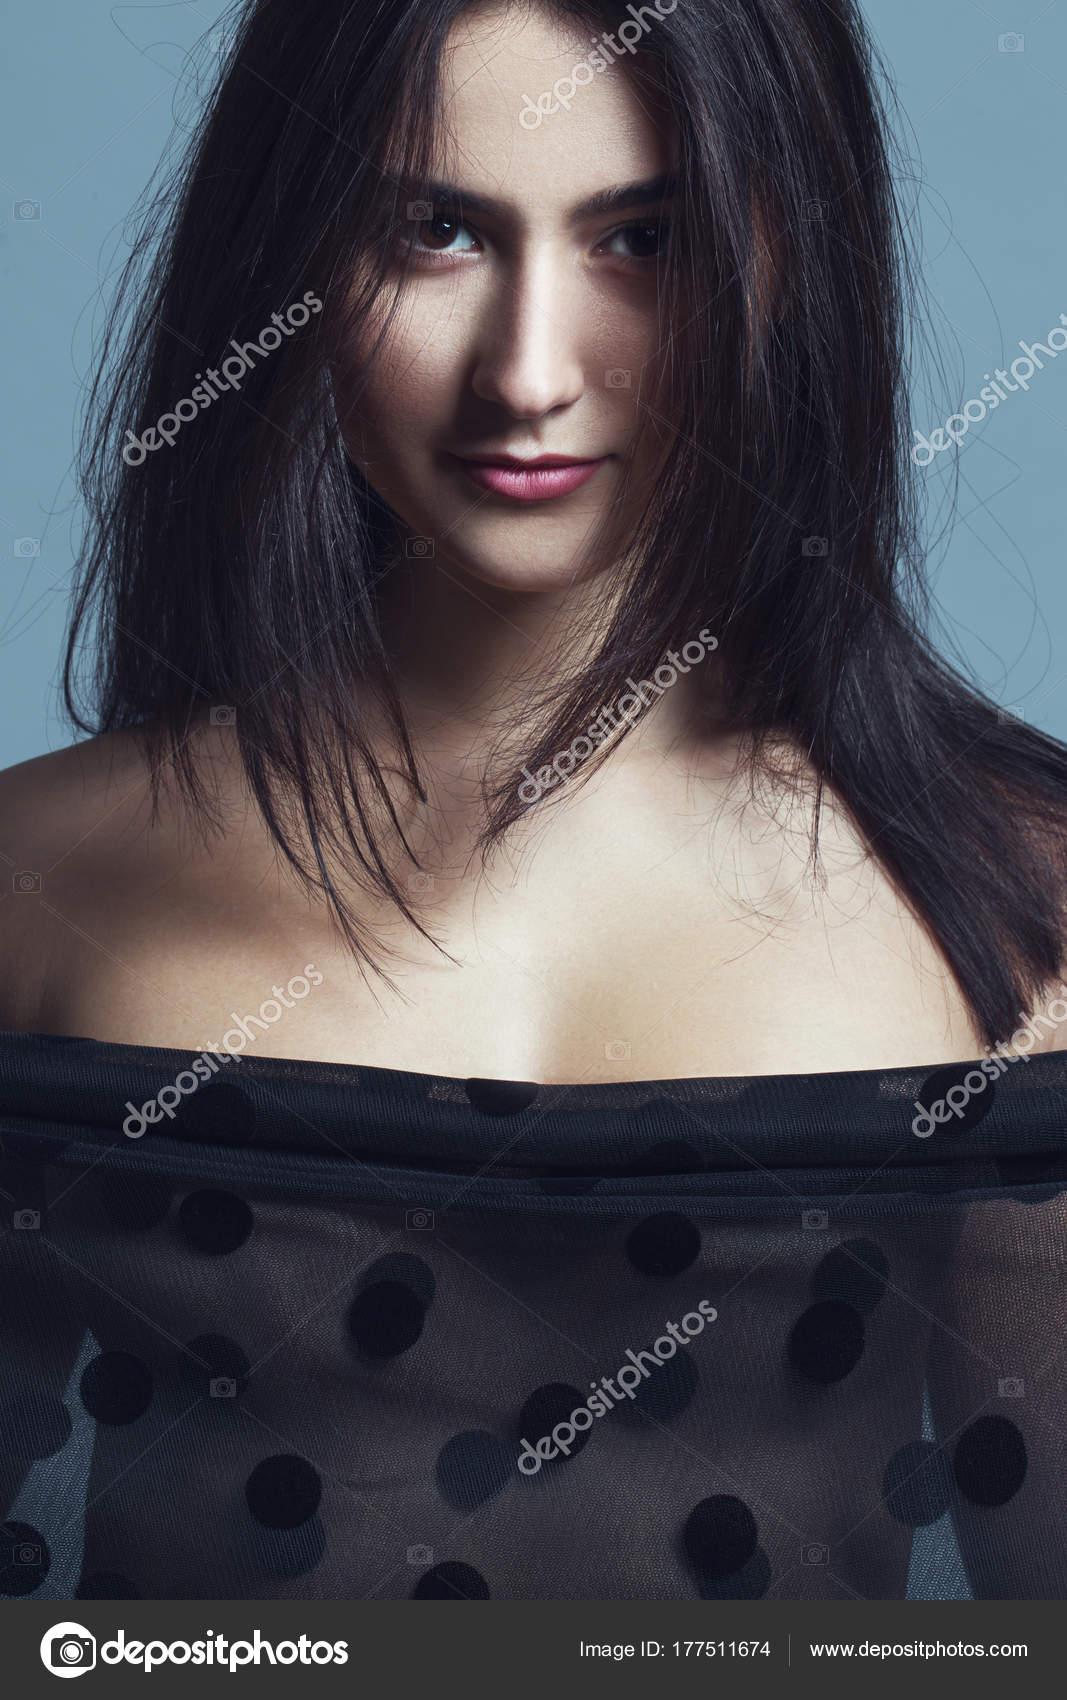 Секси девочка на сером фоне